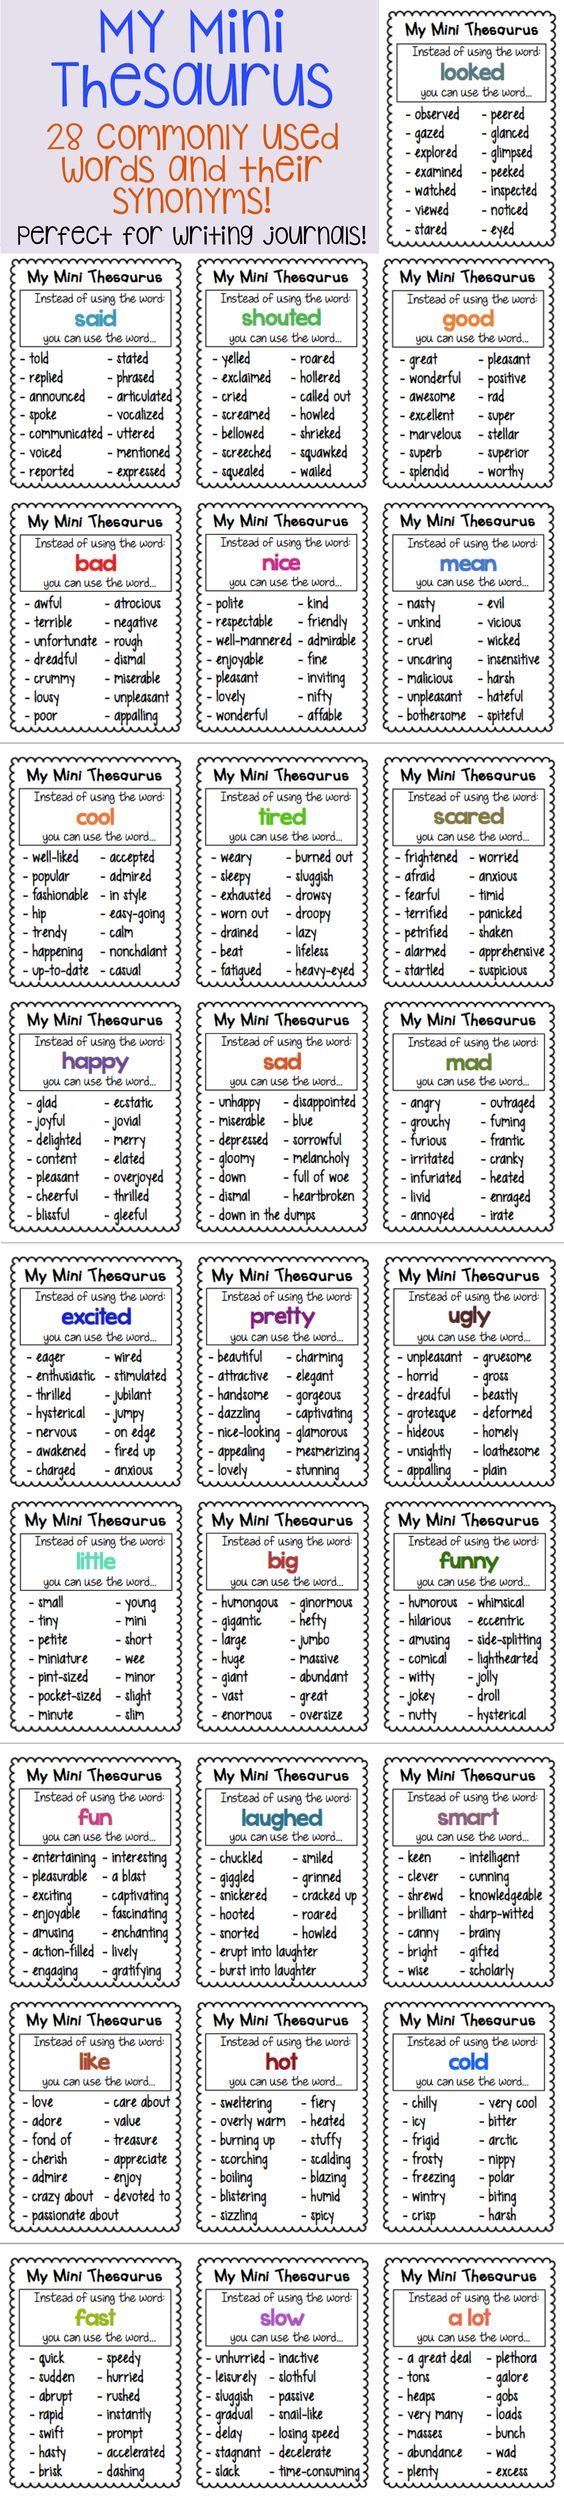 Mini Thesaurus to improve our expression skills - Language